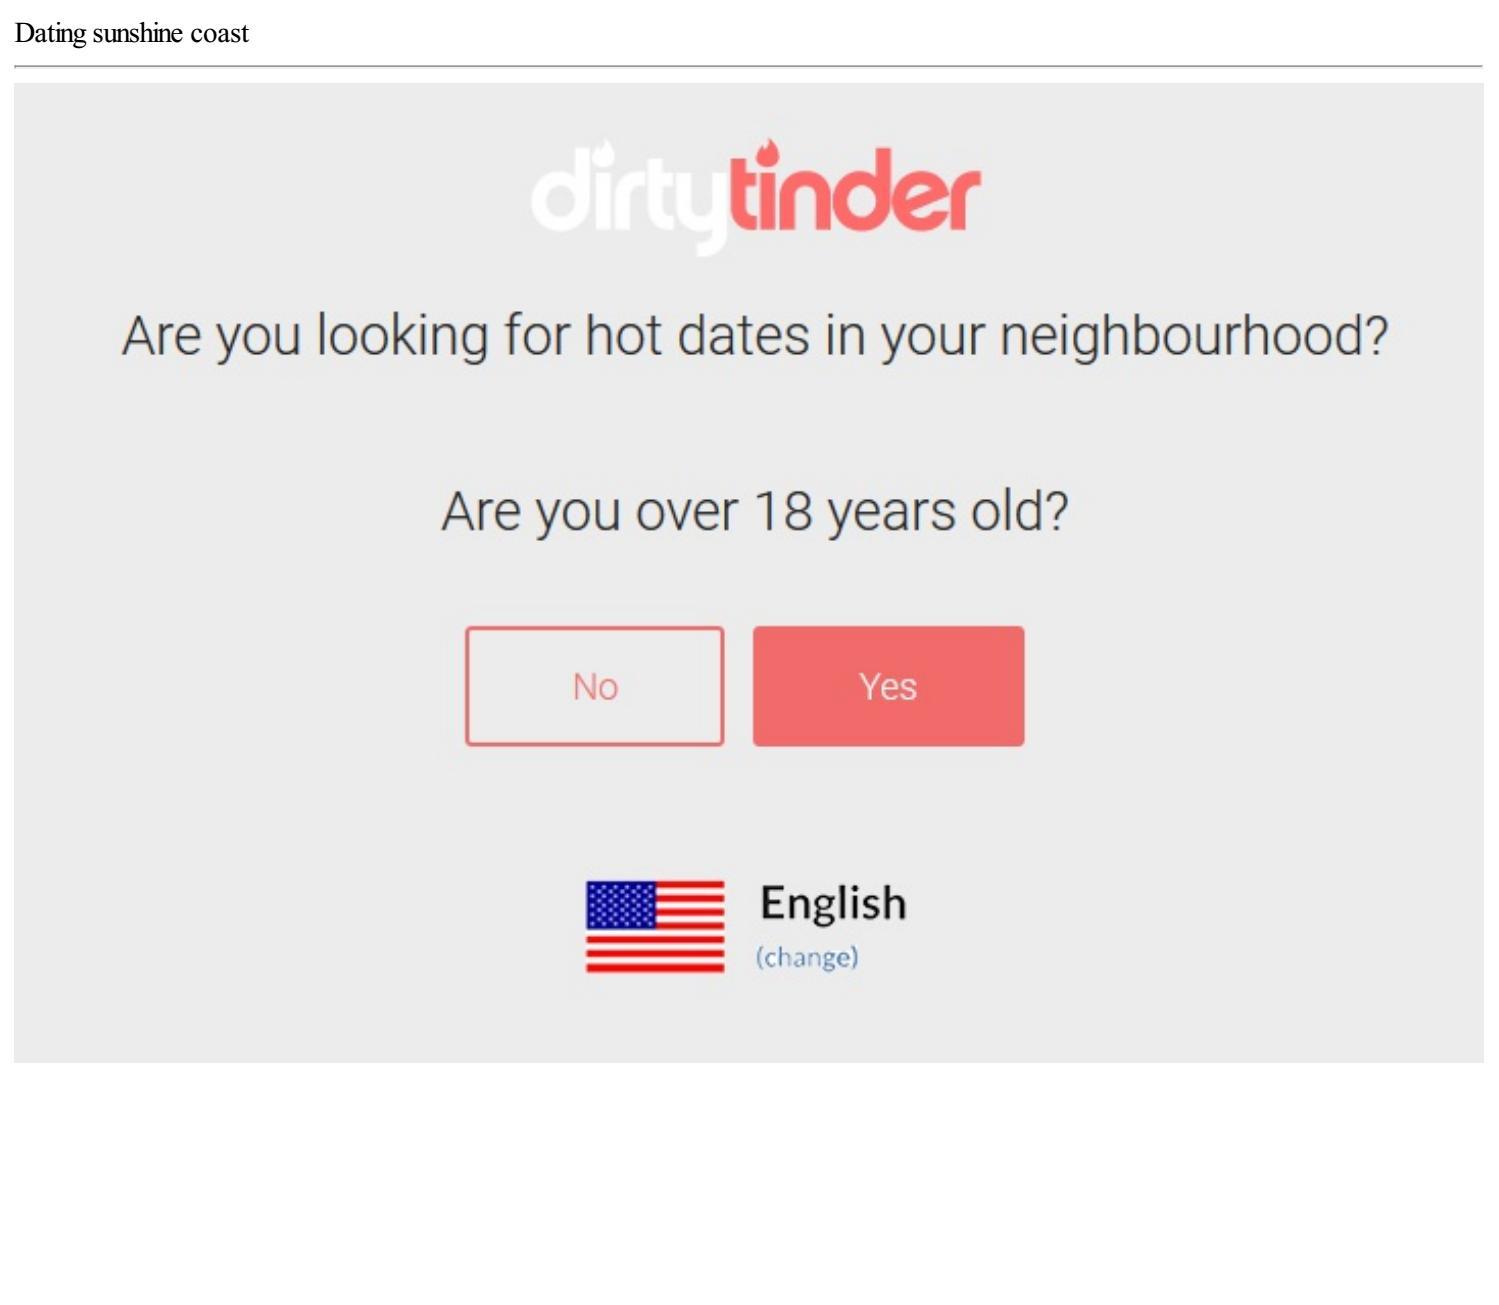 Sunshine dating site